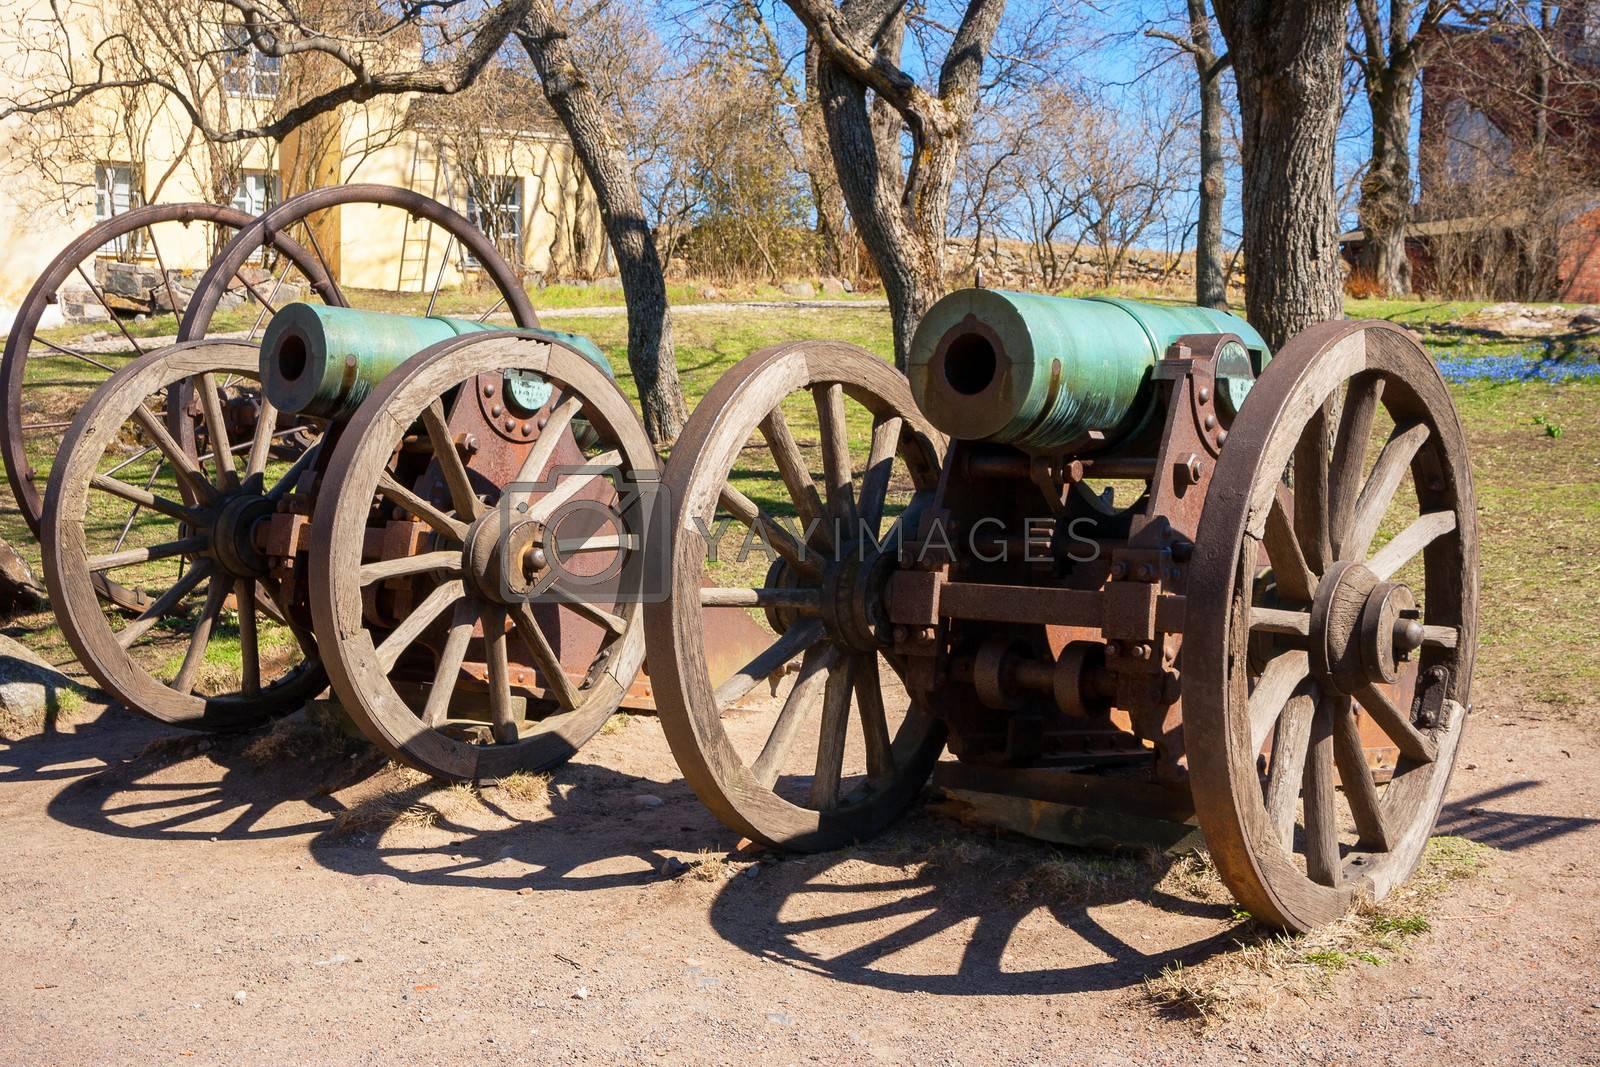 Historic cannon at Suomenlinna maritime fortress. Helsinki, Finland